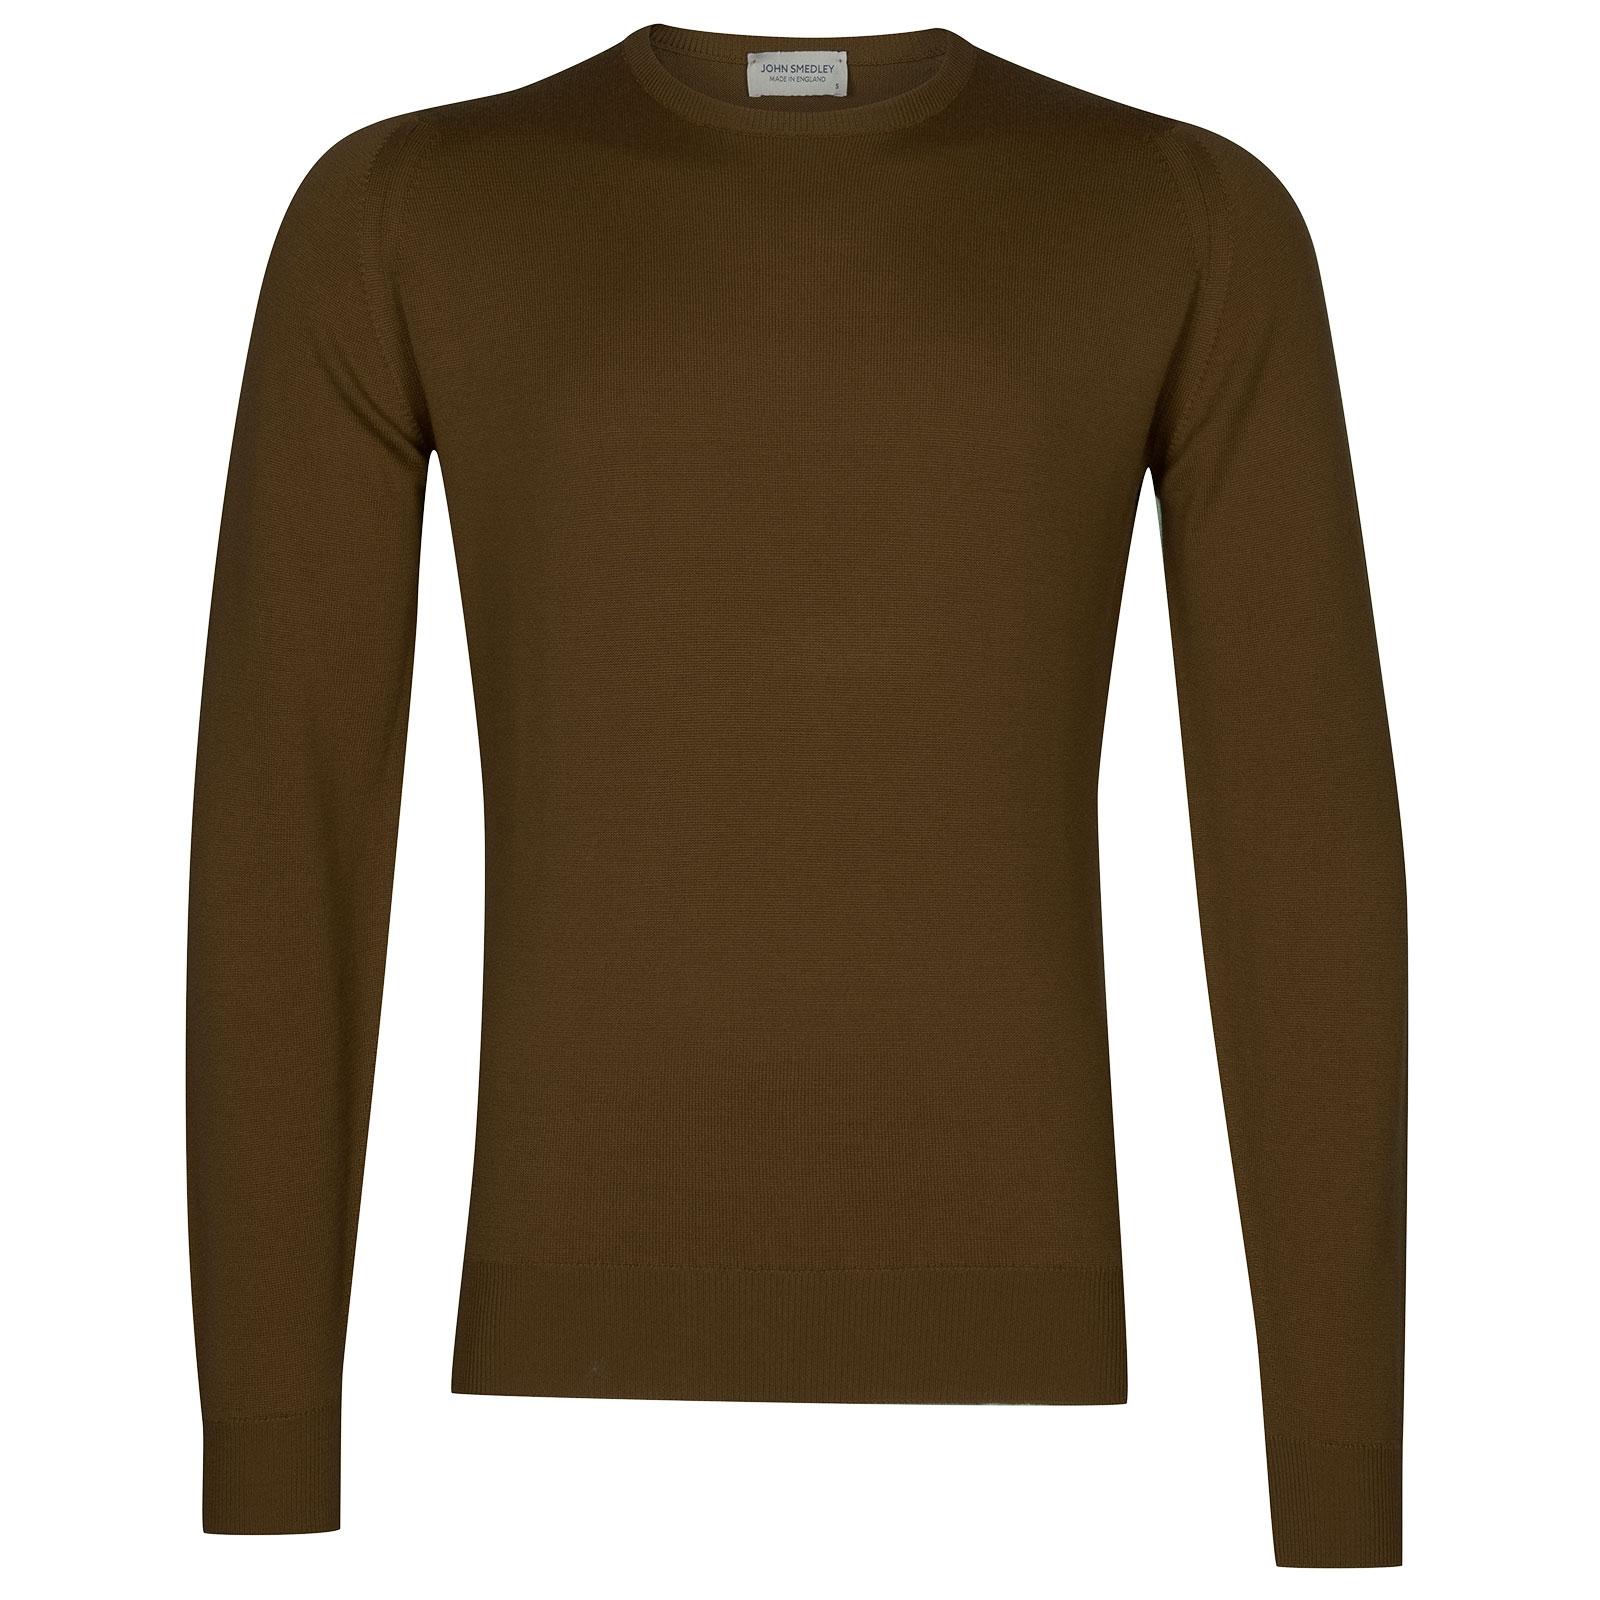 John Smedley Farhill Merino Wool Pullover in Khaki-XL